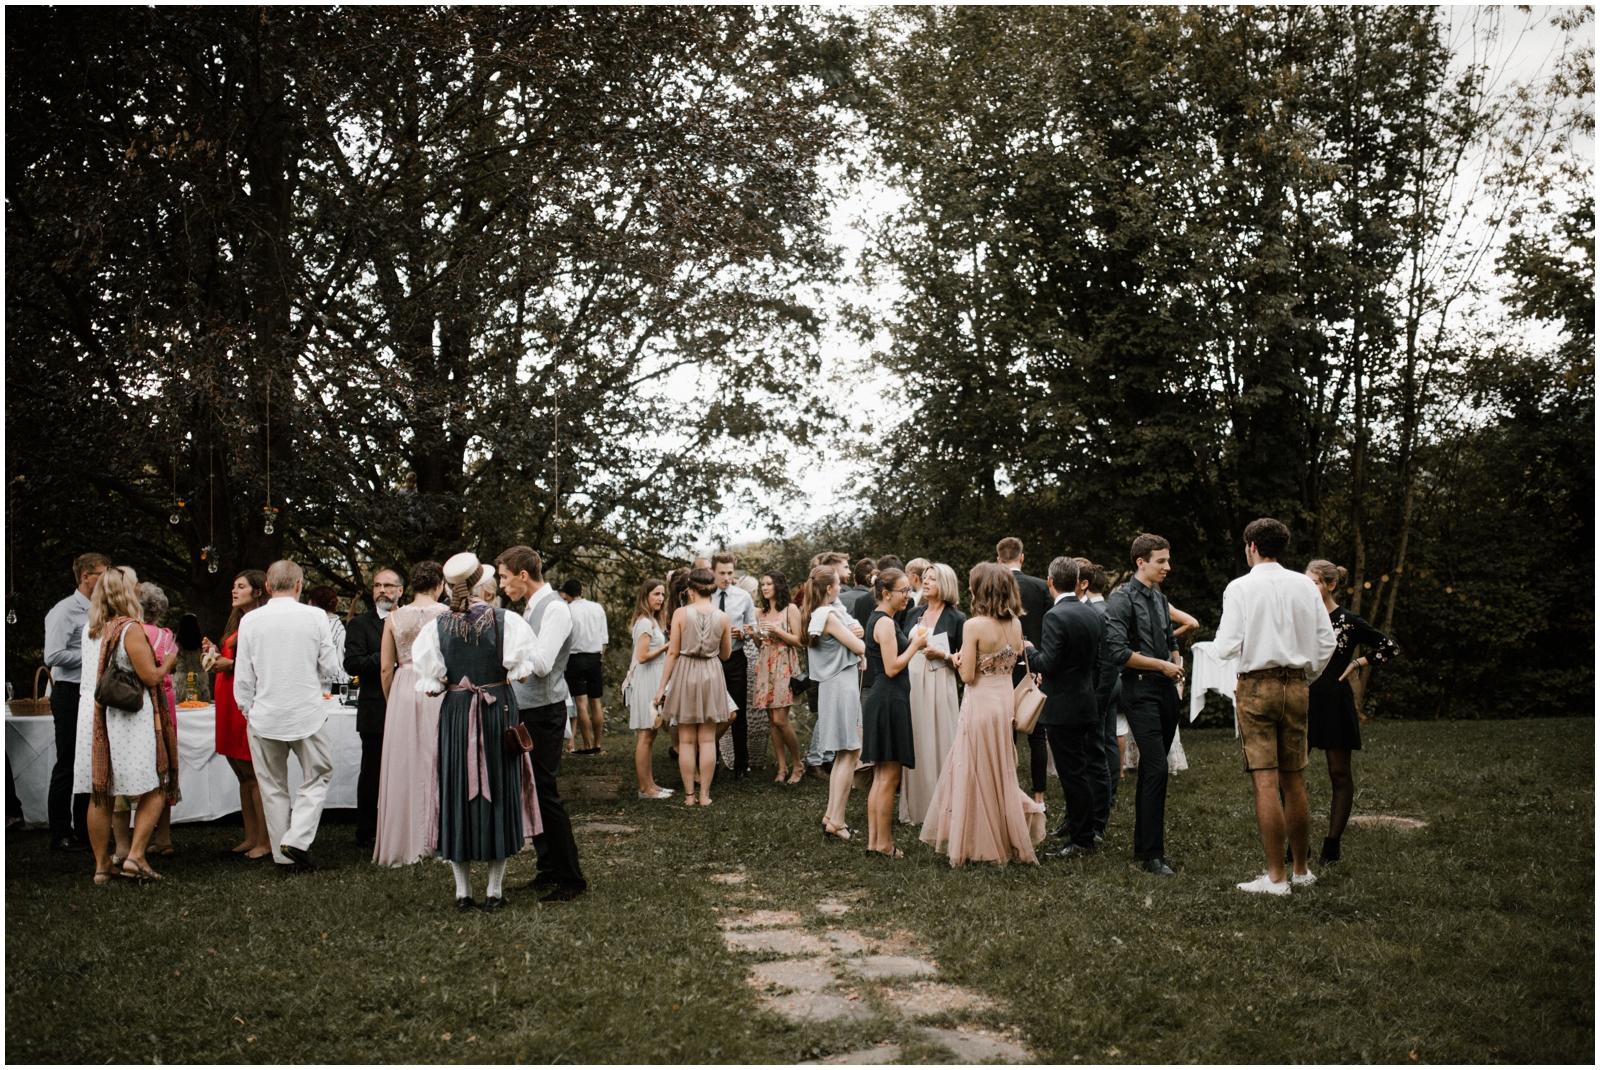 mirjam_thomas_wedding-464.jpg